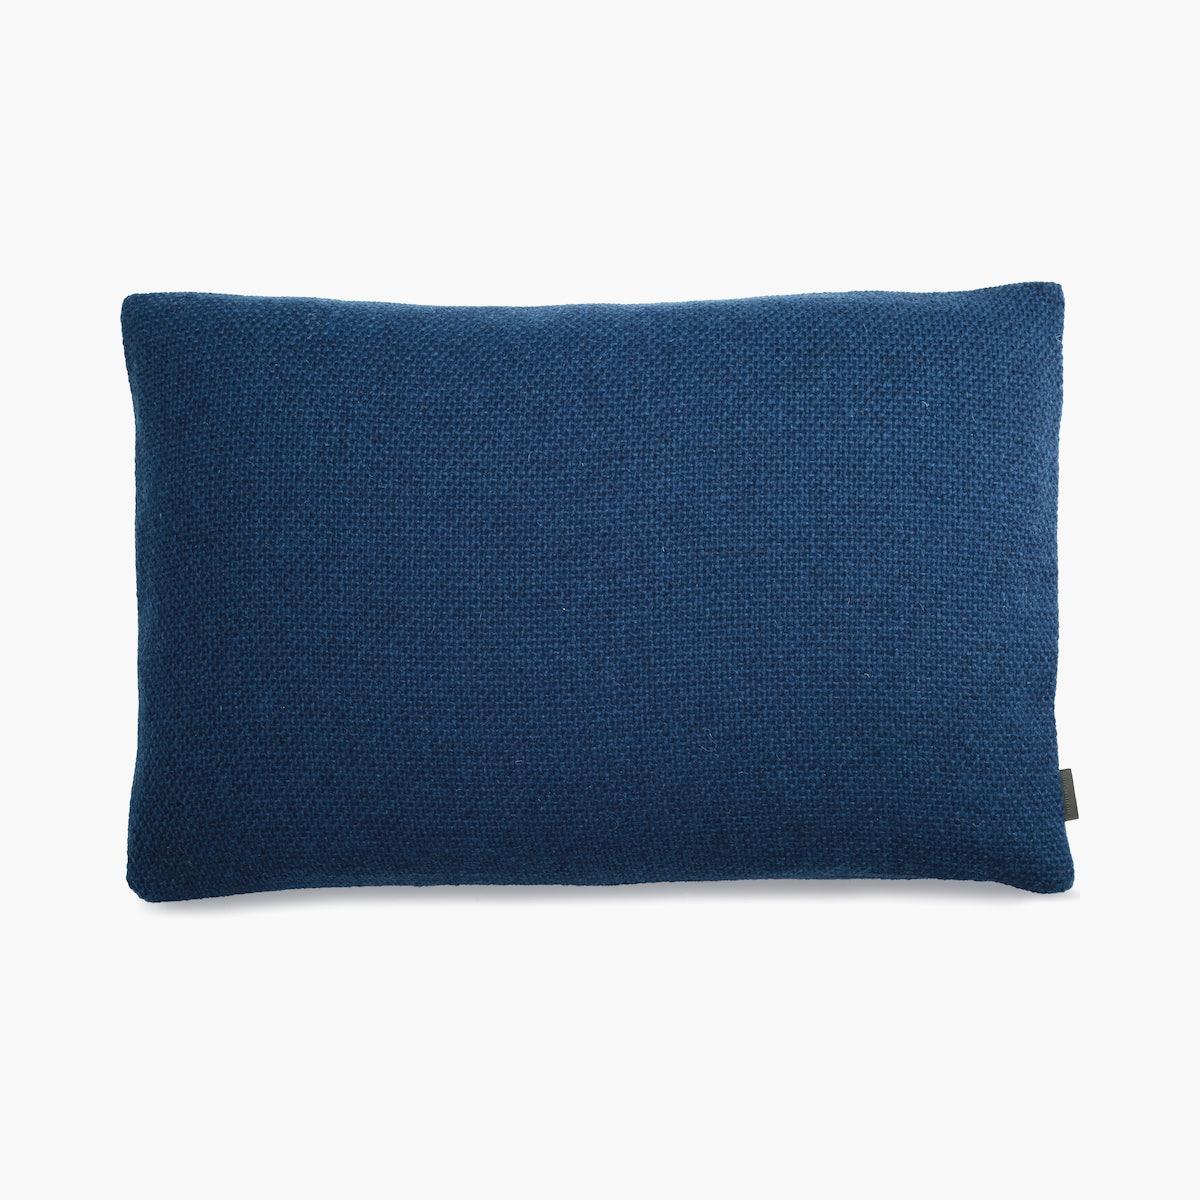 Superweave PIllow